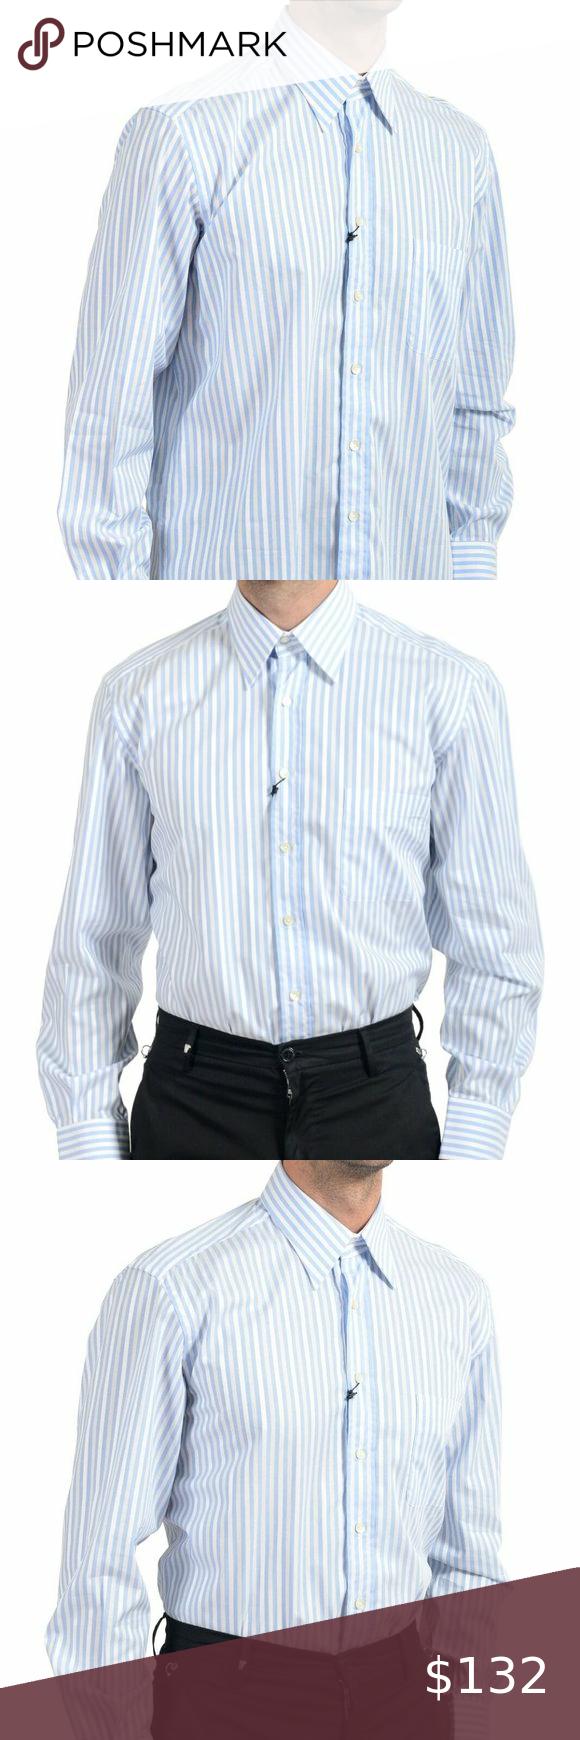 Dolce Gabbana Men S Striped Dress Shirt Mens Shirt Dress Dolce And Gabbana Shirts Shirt Dress [ 1740 x 580 Pixel ]